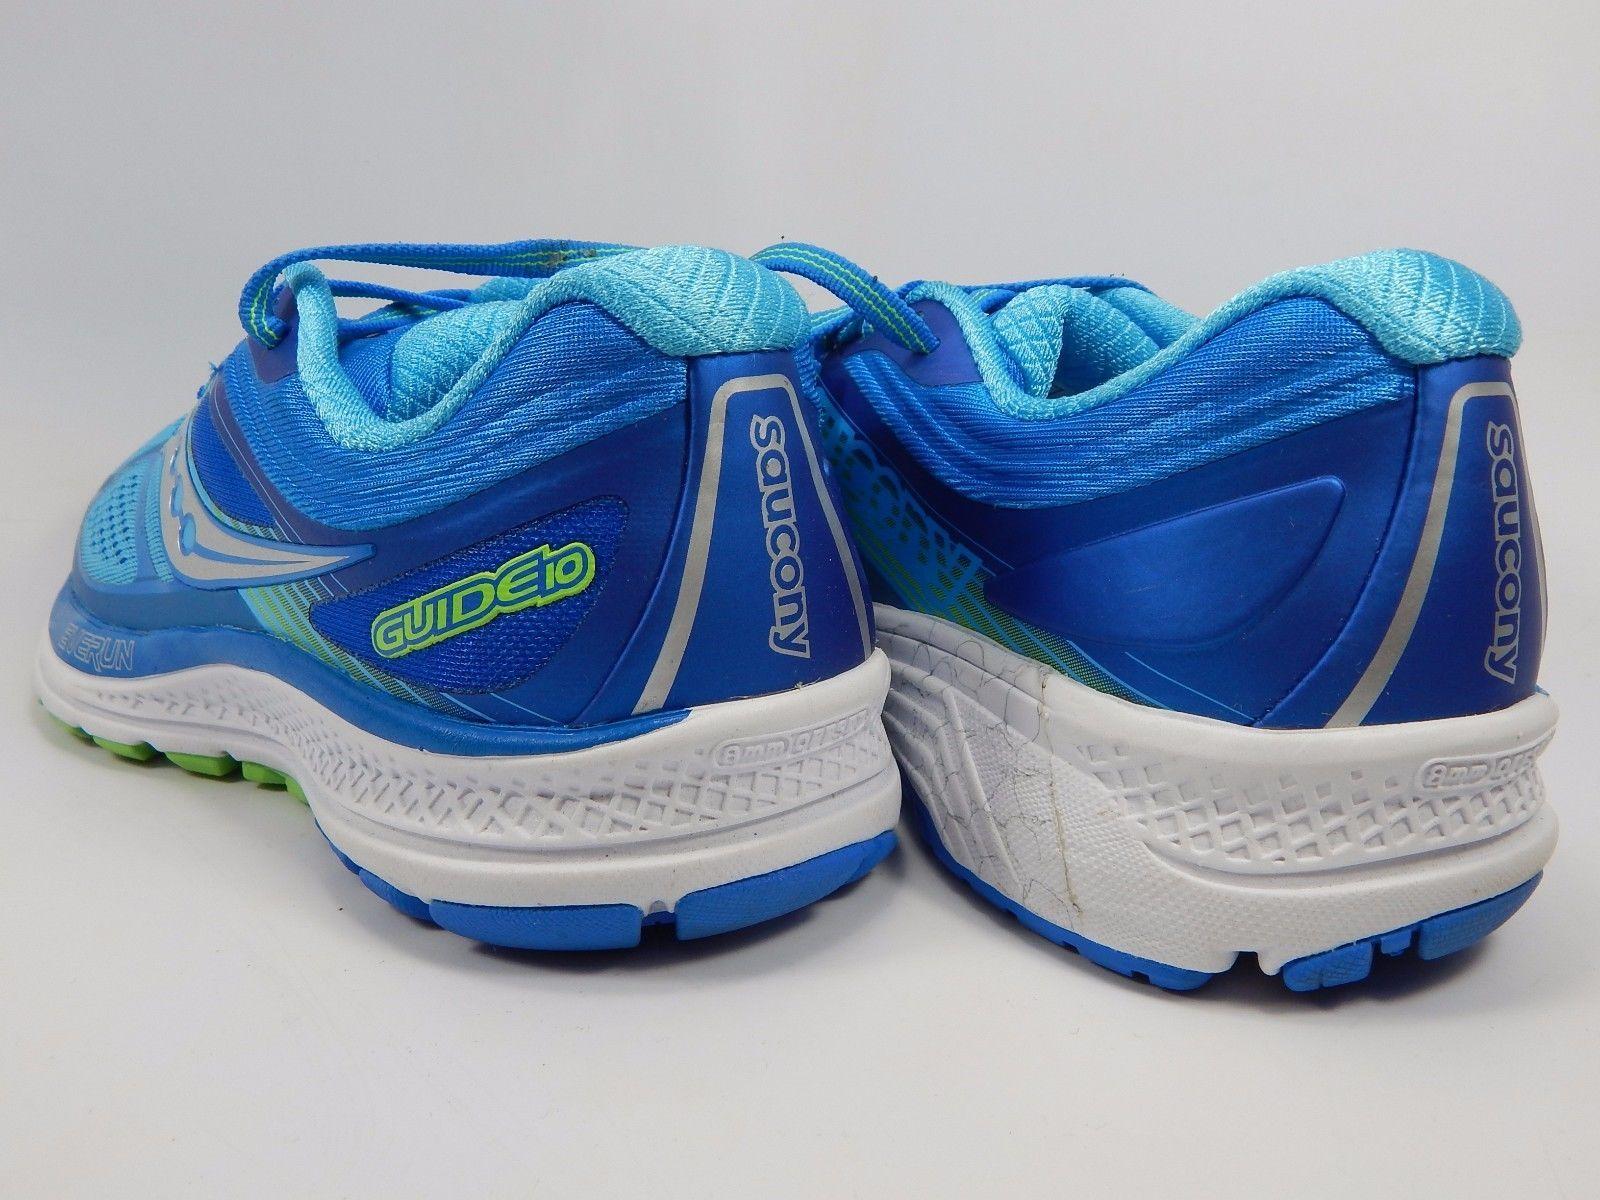 Saucony Guide 10 Women's Running Shoes Size US 7.5 M (B) EU 38.5 Blue S10350-1